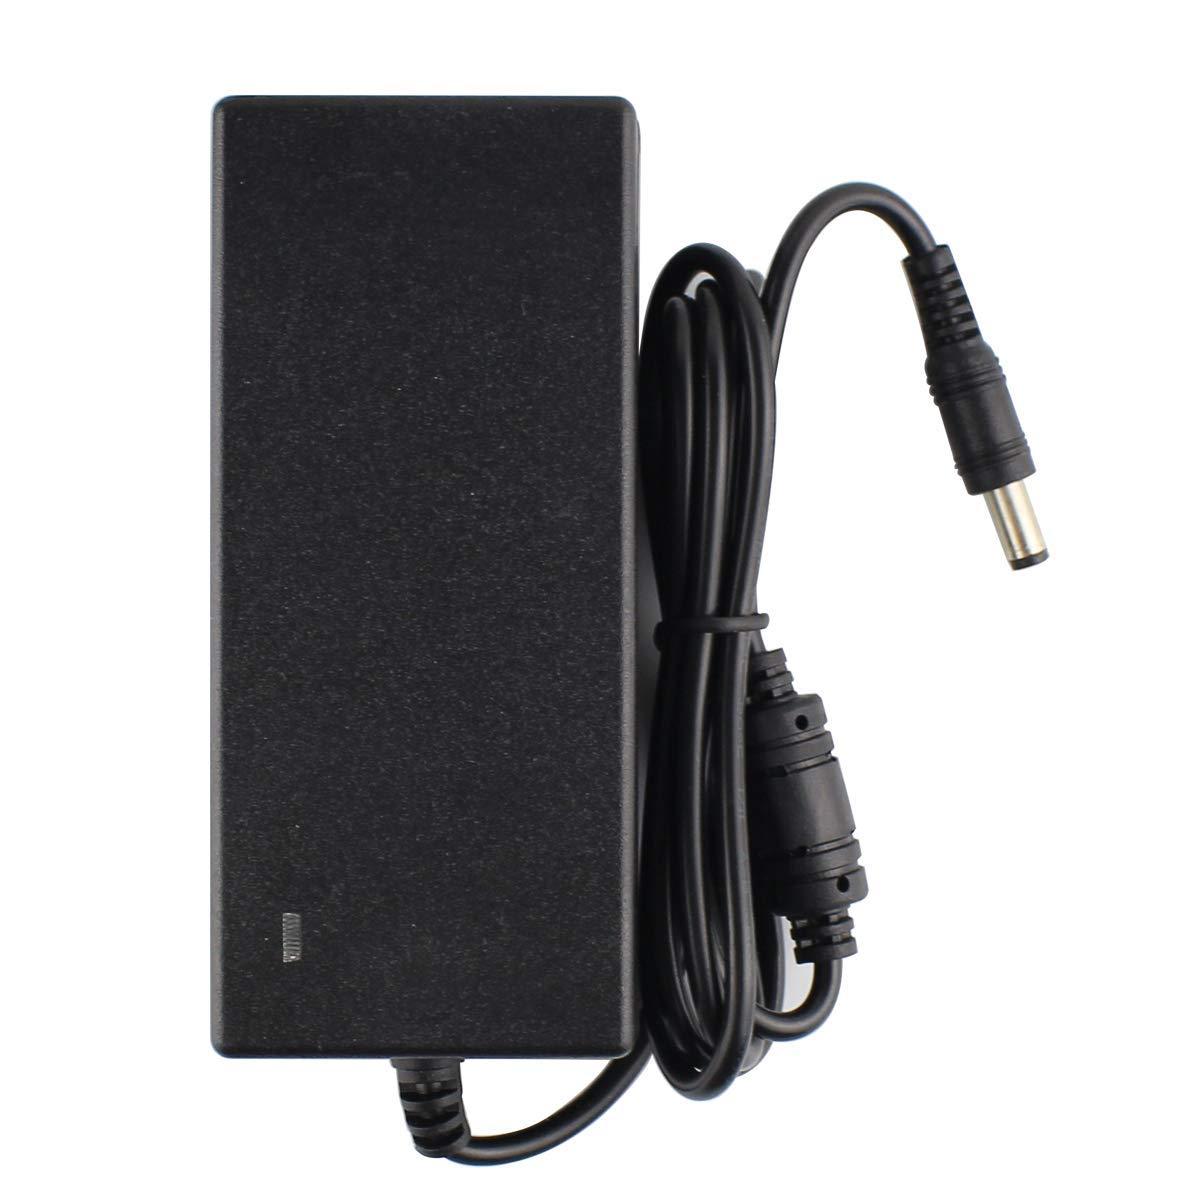 24V 3A AC Adapter For VIZIO 90012422801 VSB200 VSB205 VSB210 Sound Bar Charger